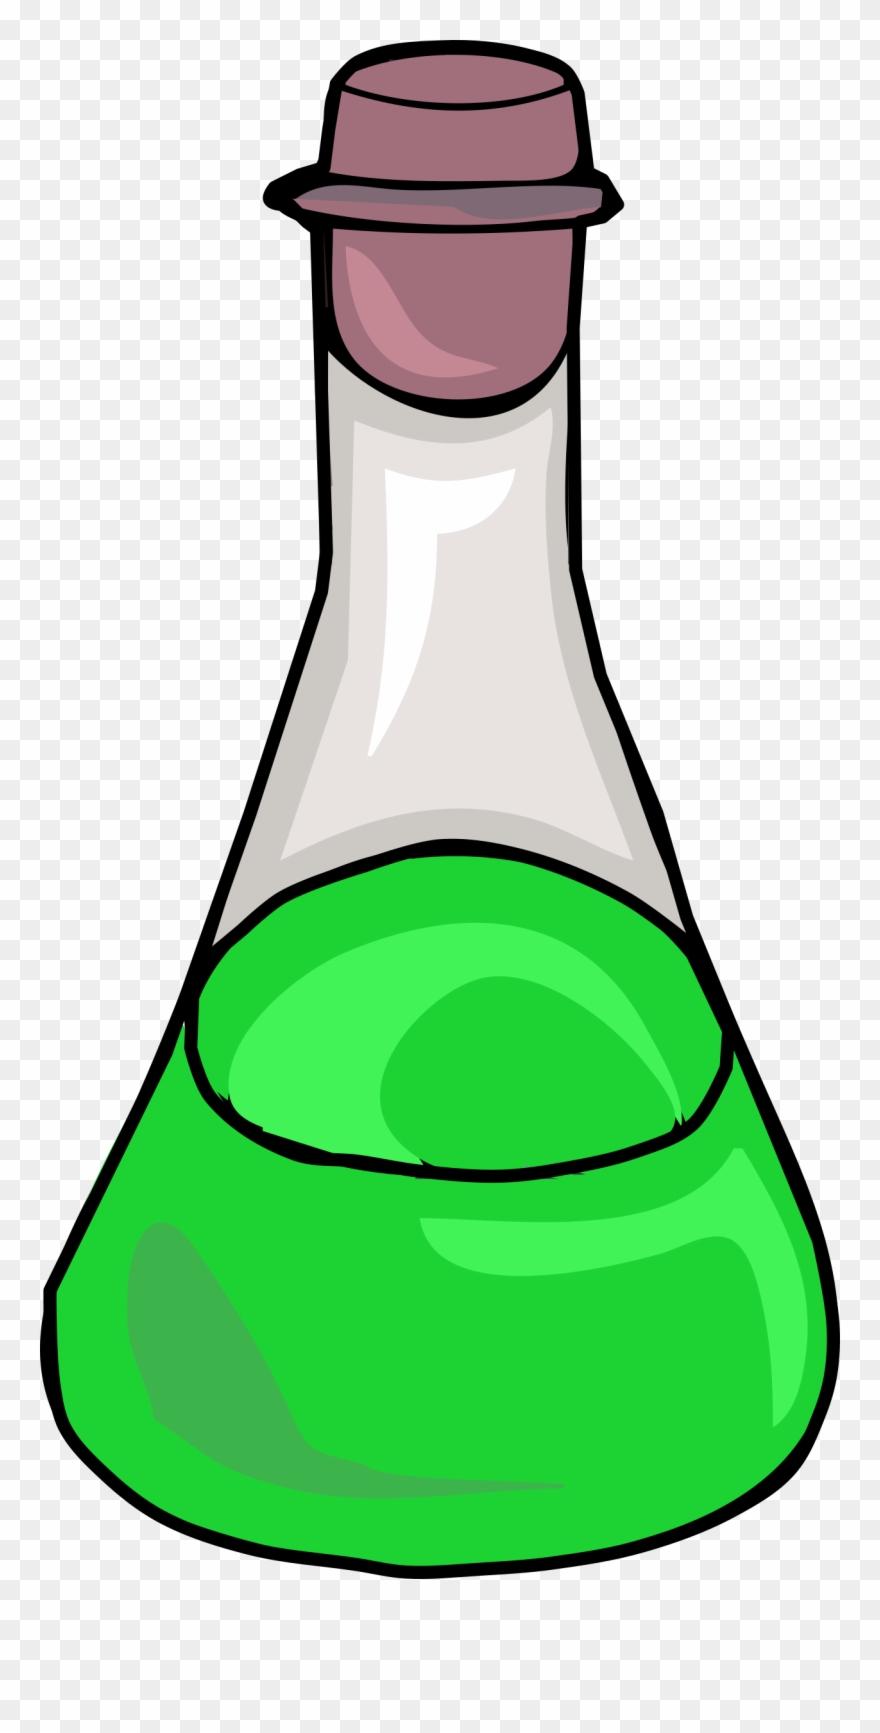 Science bottle clipart clip free Green Bottle Big Image Png - Science Bottle Clipart (#865352 ... clip free